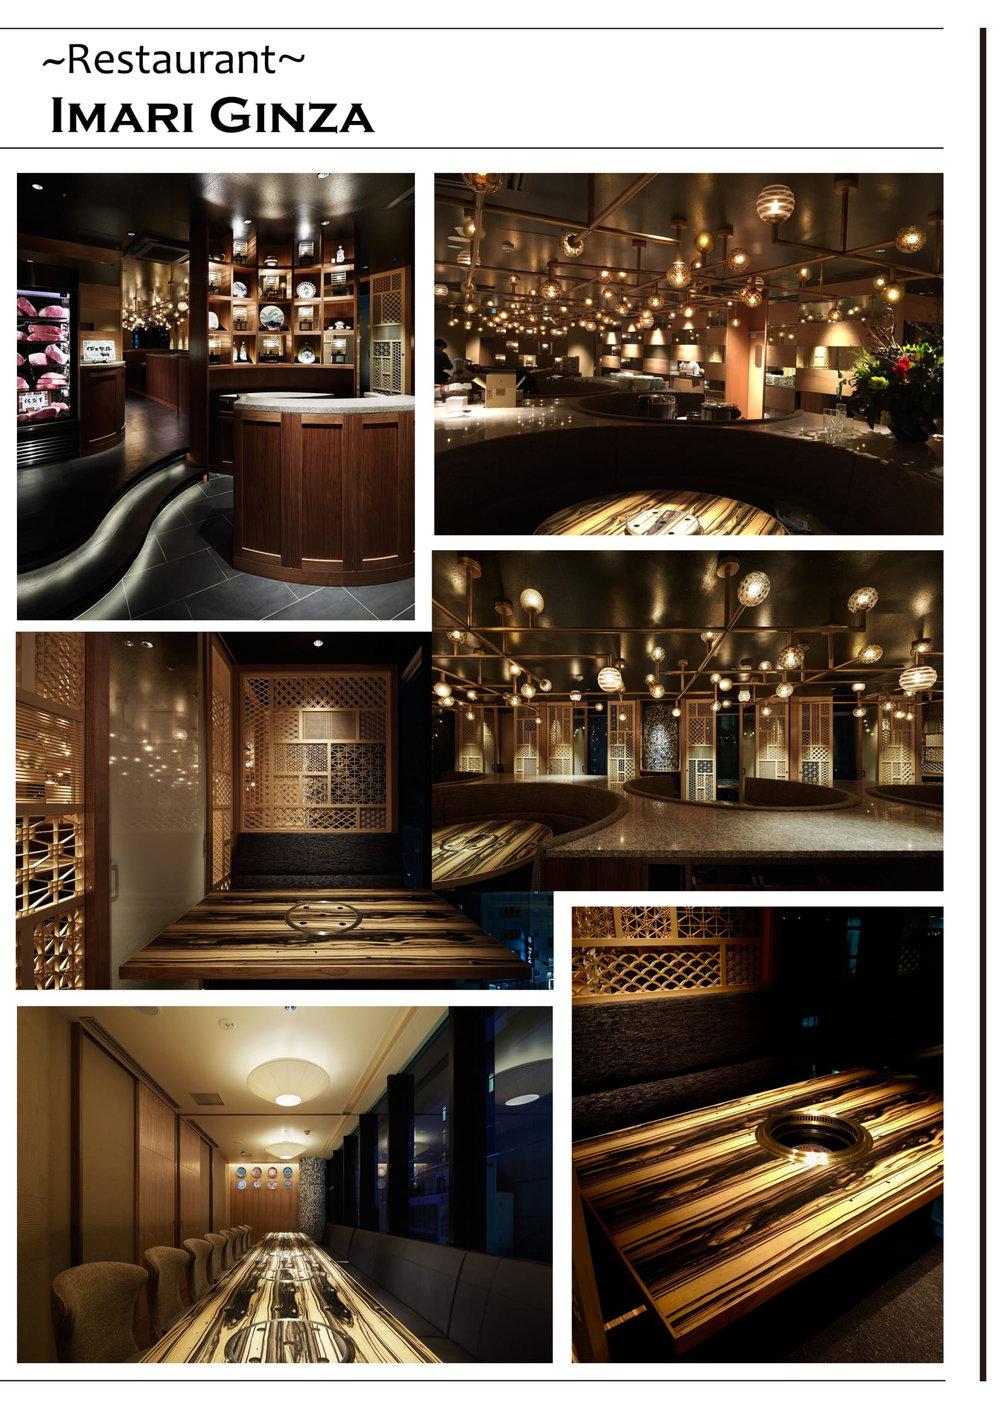 ginza imari 銀座伊万里 いまり  焼肉 vintage house ヴィンテージハウス 内装 デザイン 店舗 商店建築 bamboomedia